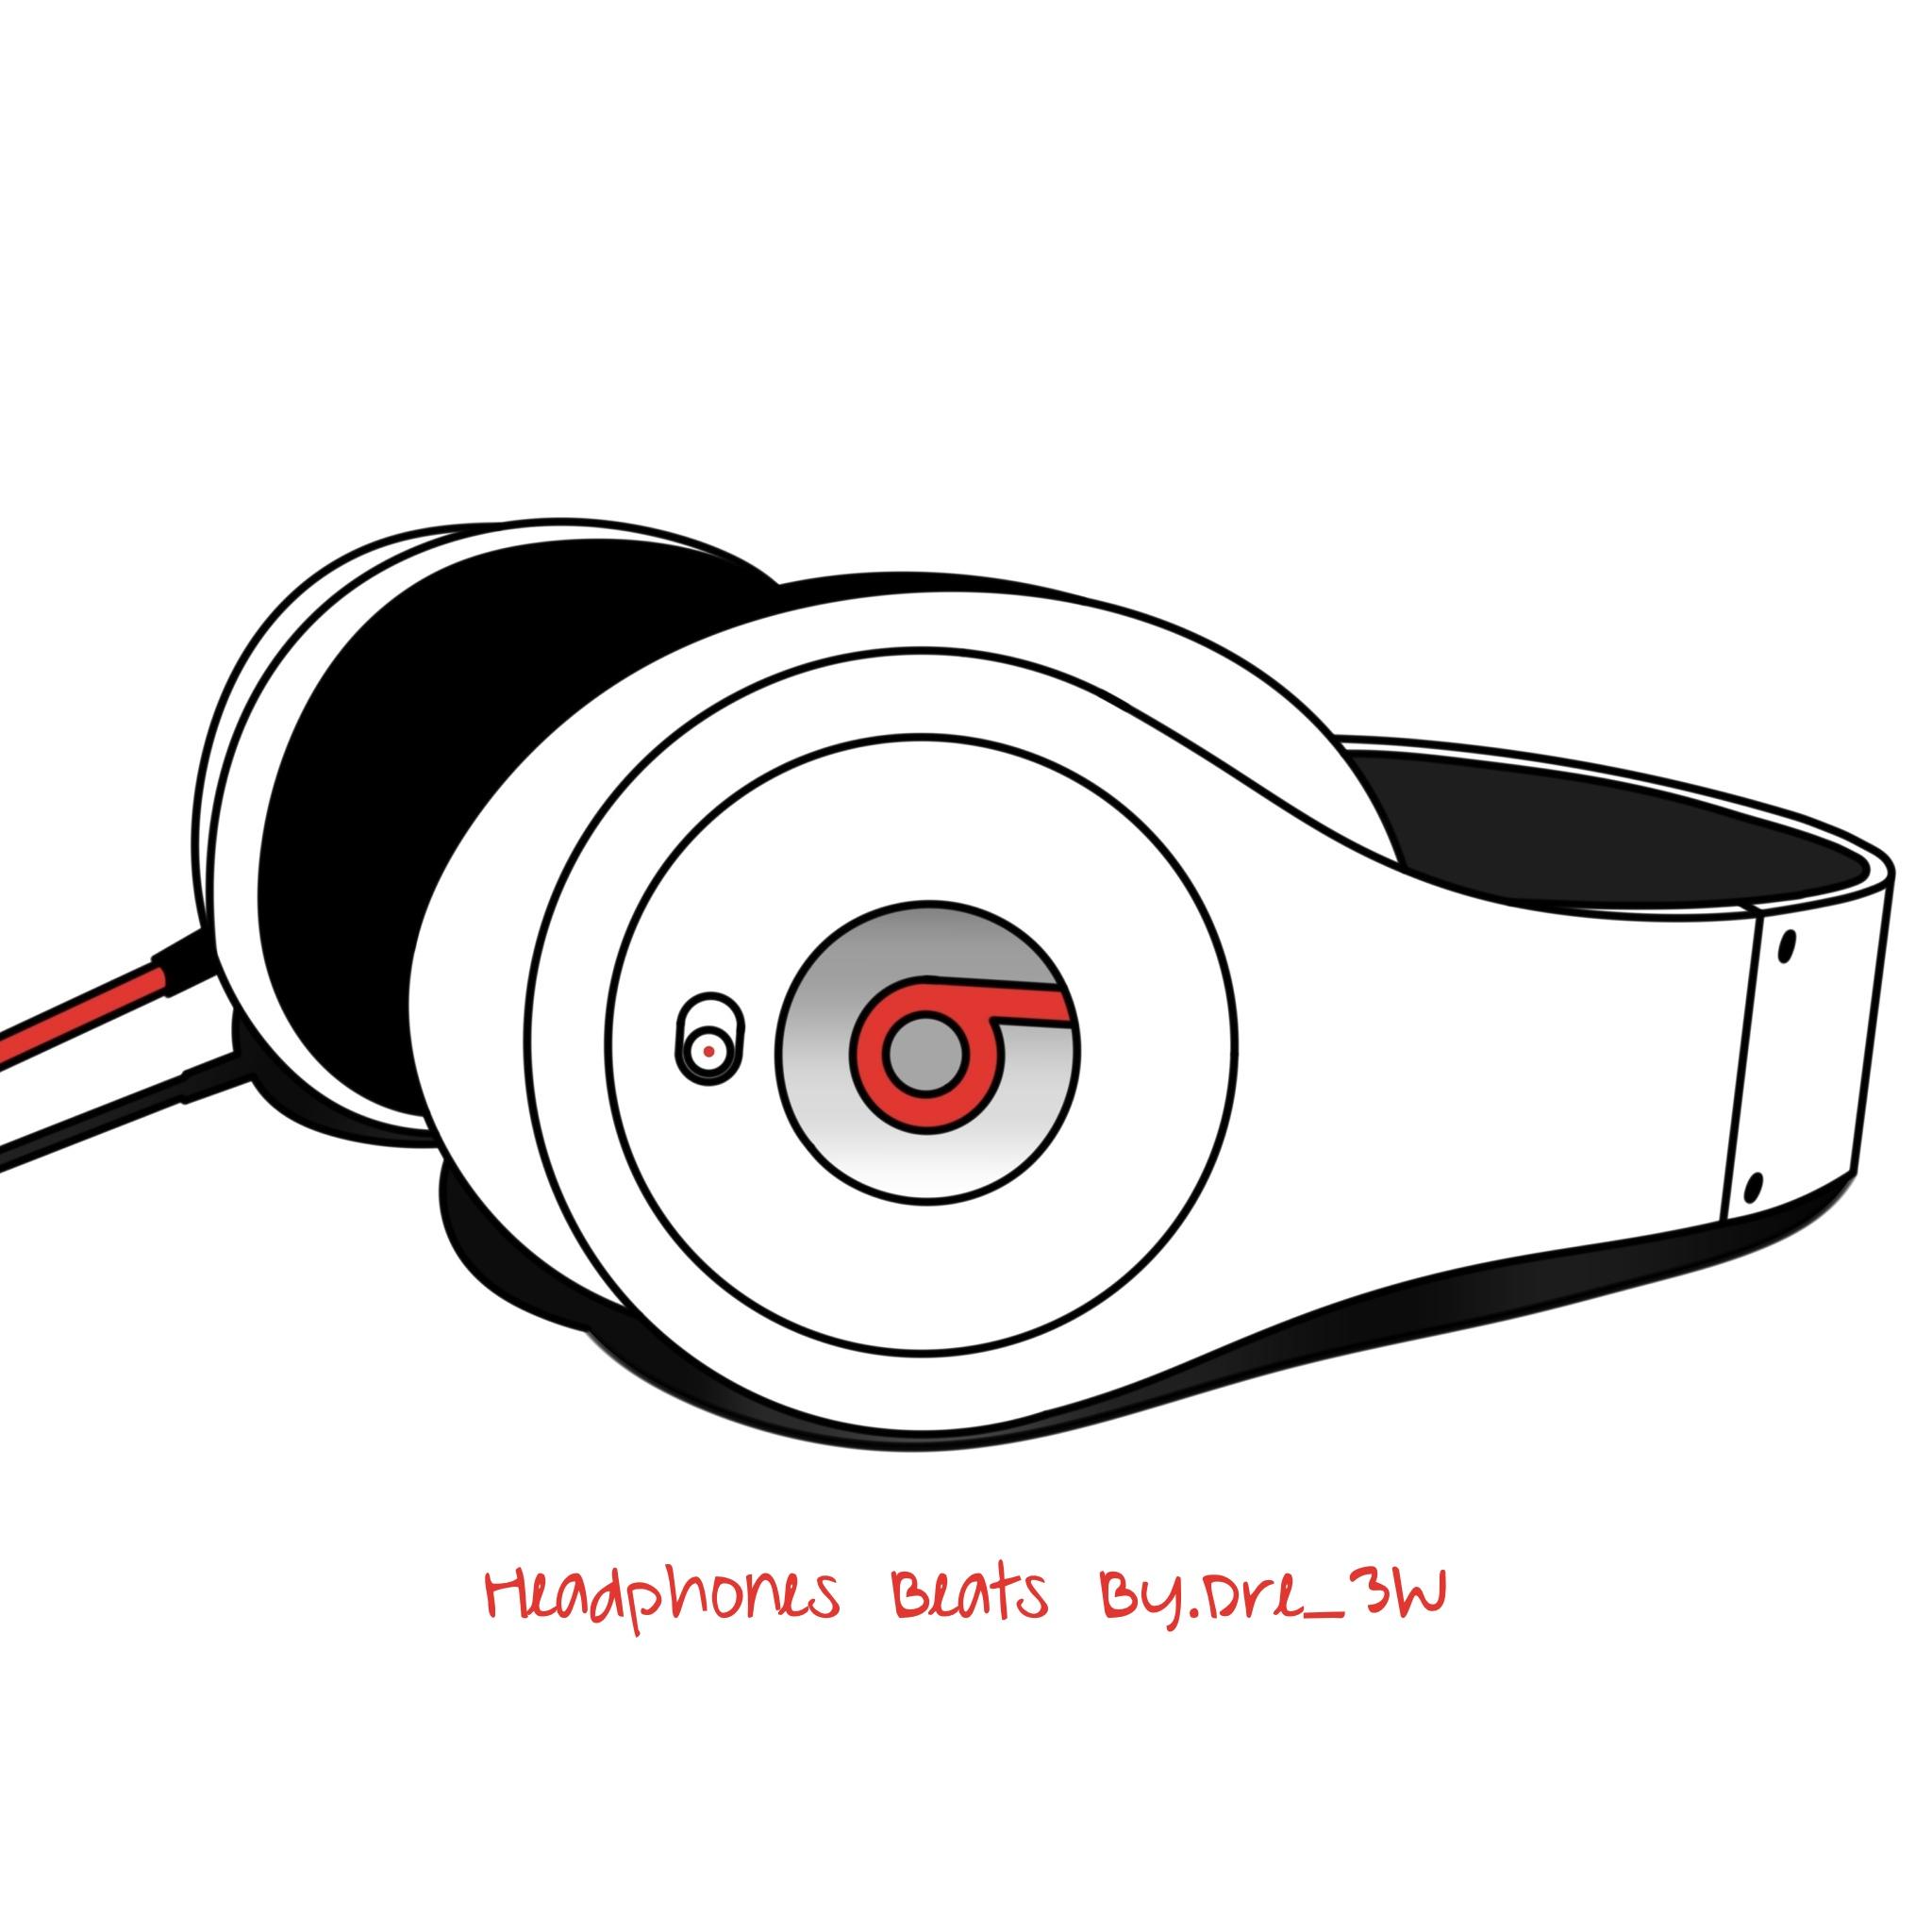 Headphones Beats By.Dre 3W iPad Headphones Beats By.Dre   iPad